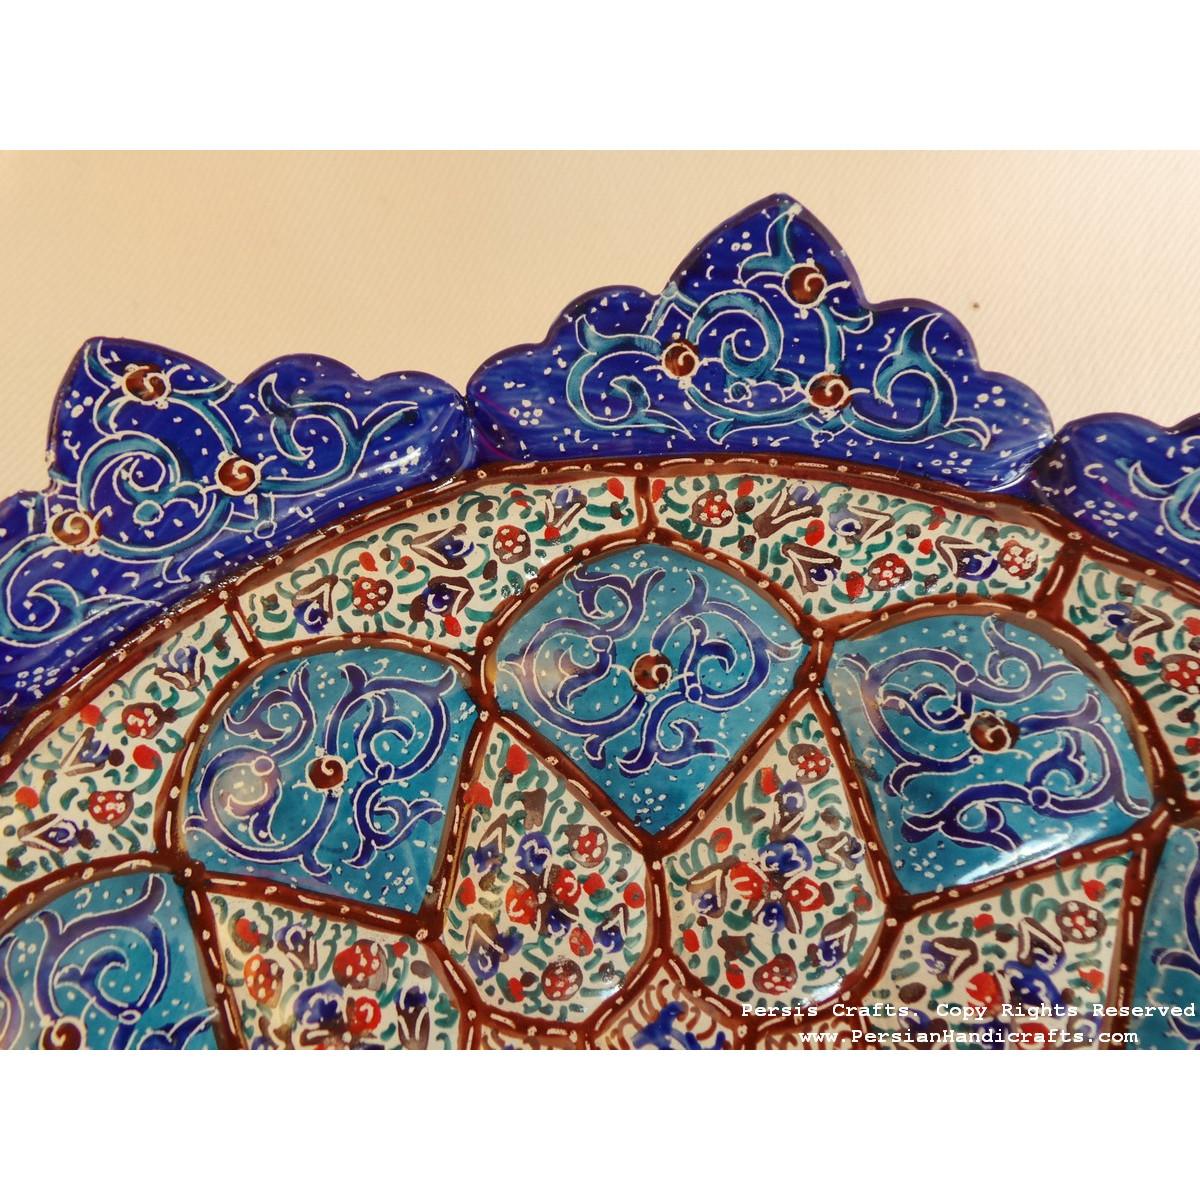 Wall Hanging Plate - Enamel (Minakari) on Copper - HE3025-Persian Handicrafts